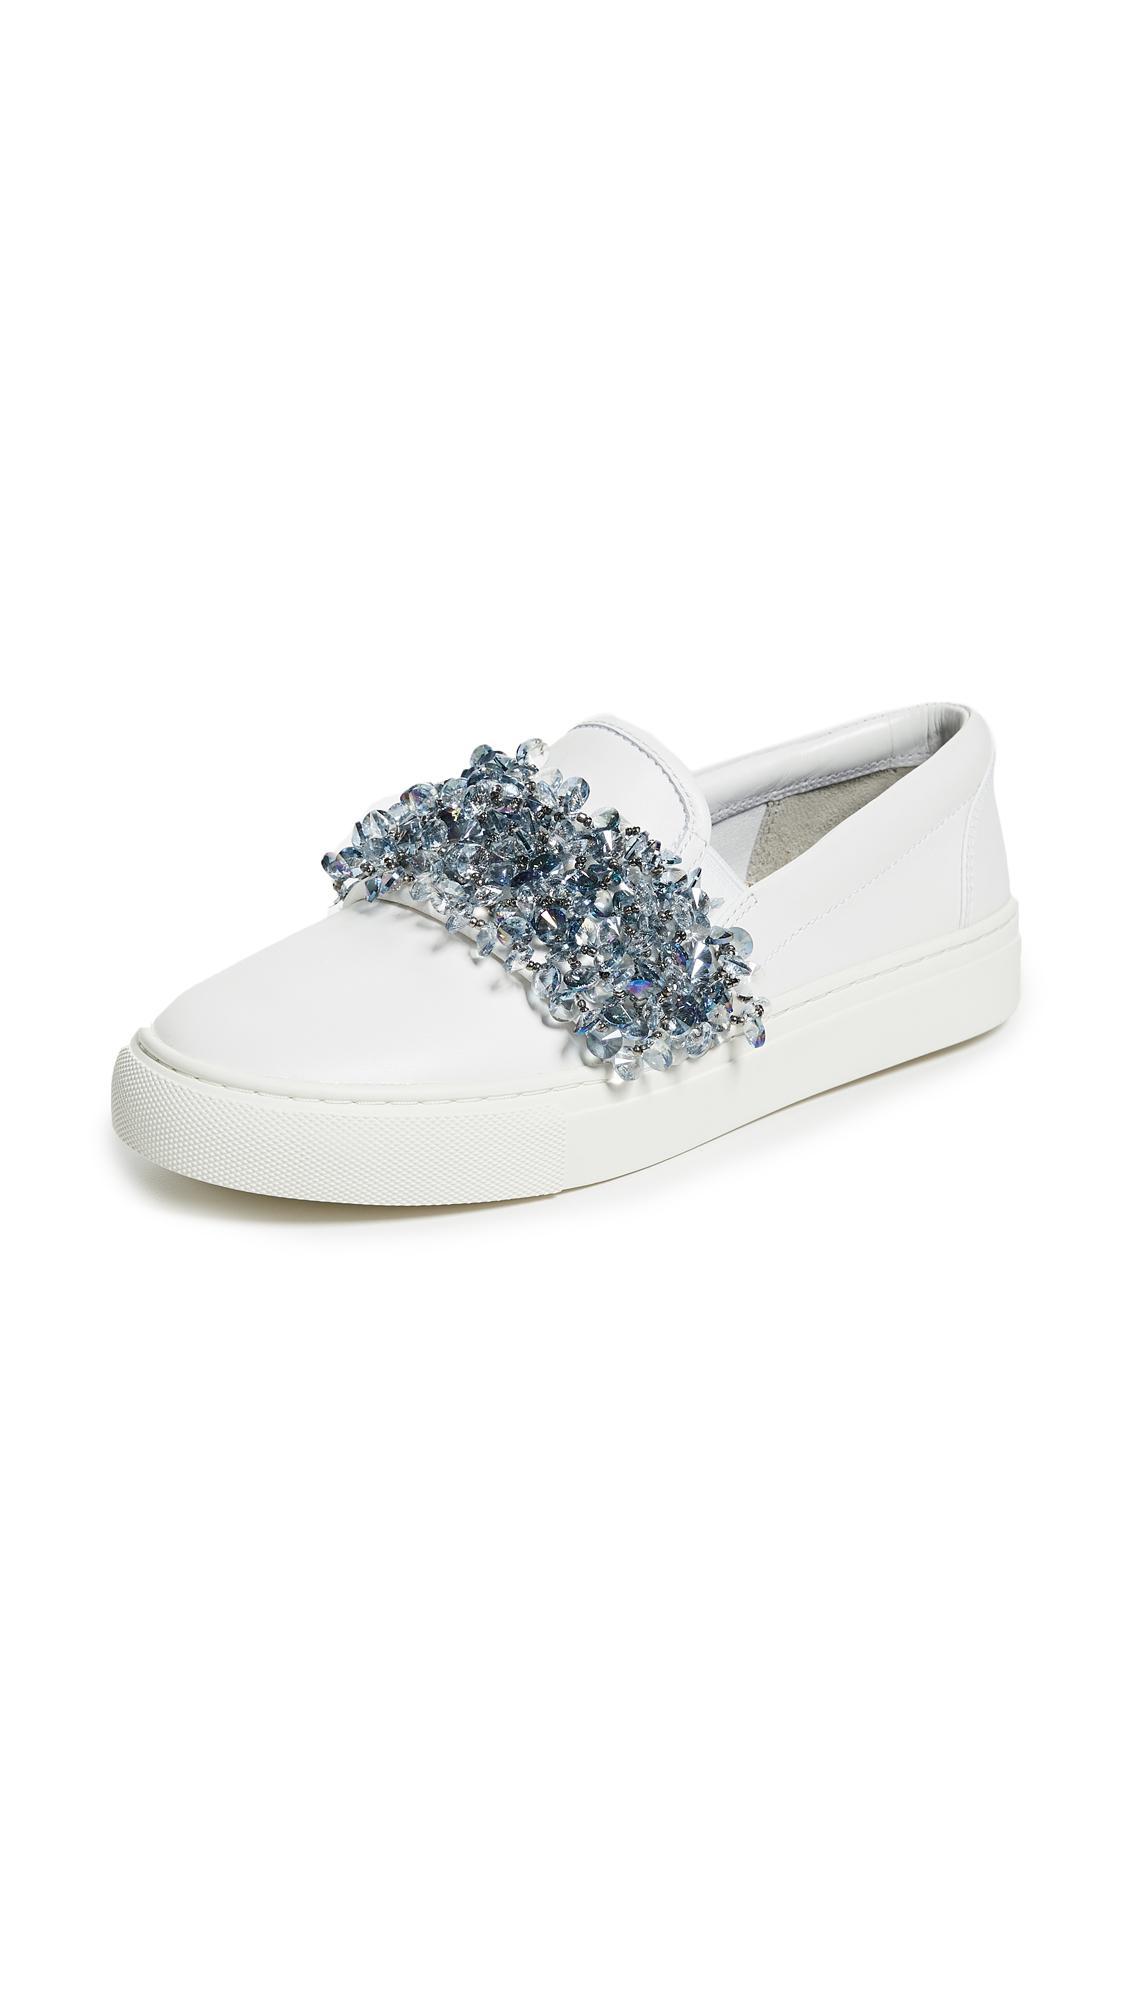 Tory Burch Logan embellished slip on sneakers Countdown Package Cheap Online 4Z0ko1t